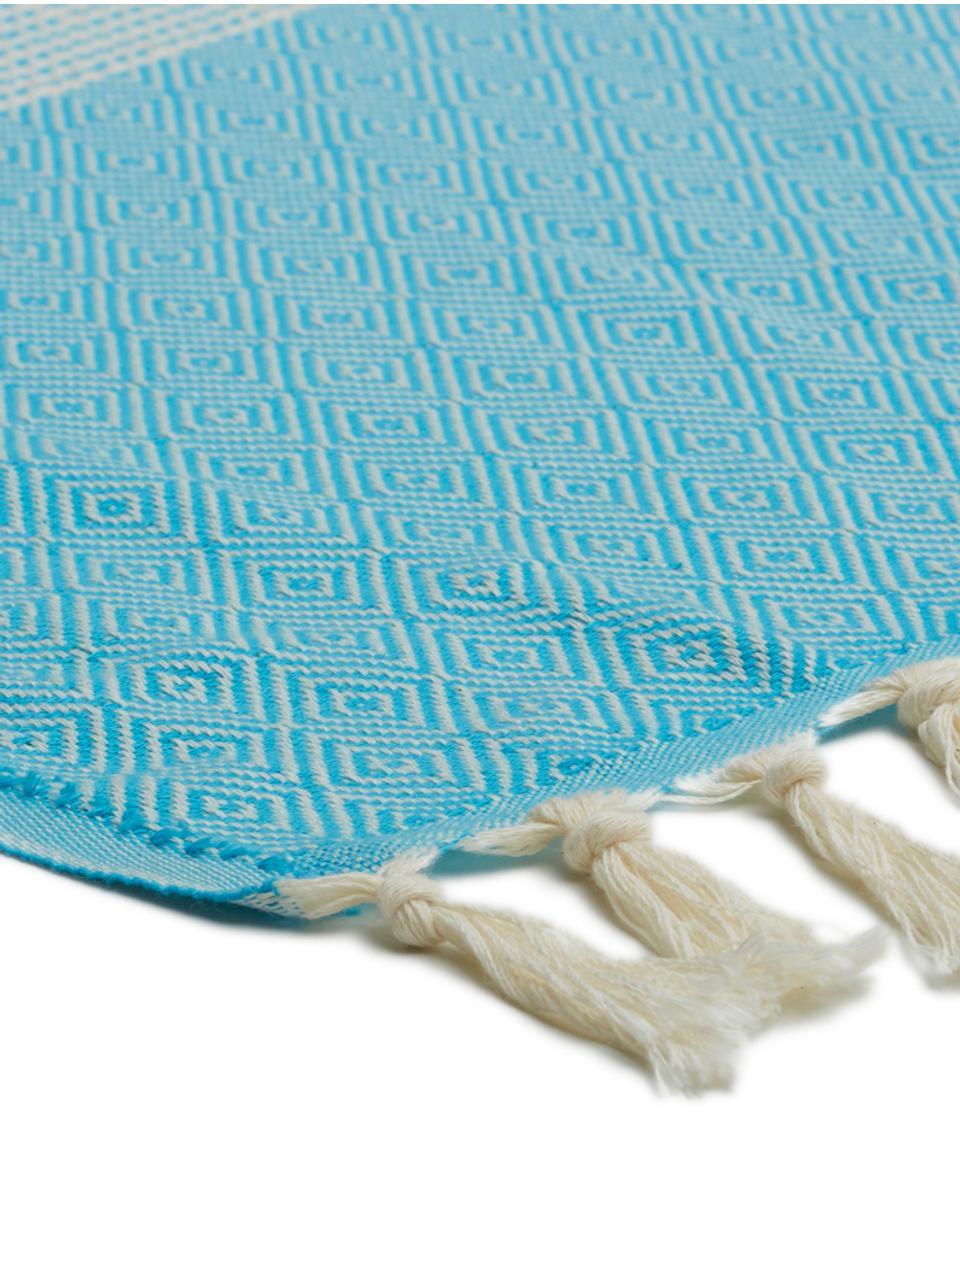 Plaid in cotone Lounge Diamond, 100% cotone, Blu, bianco latteo, Larg. 100 x Lung. 180 cm